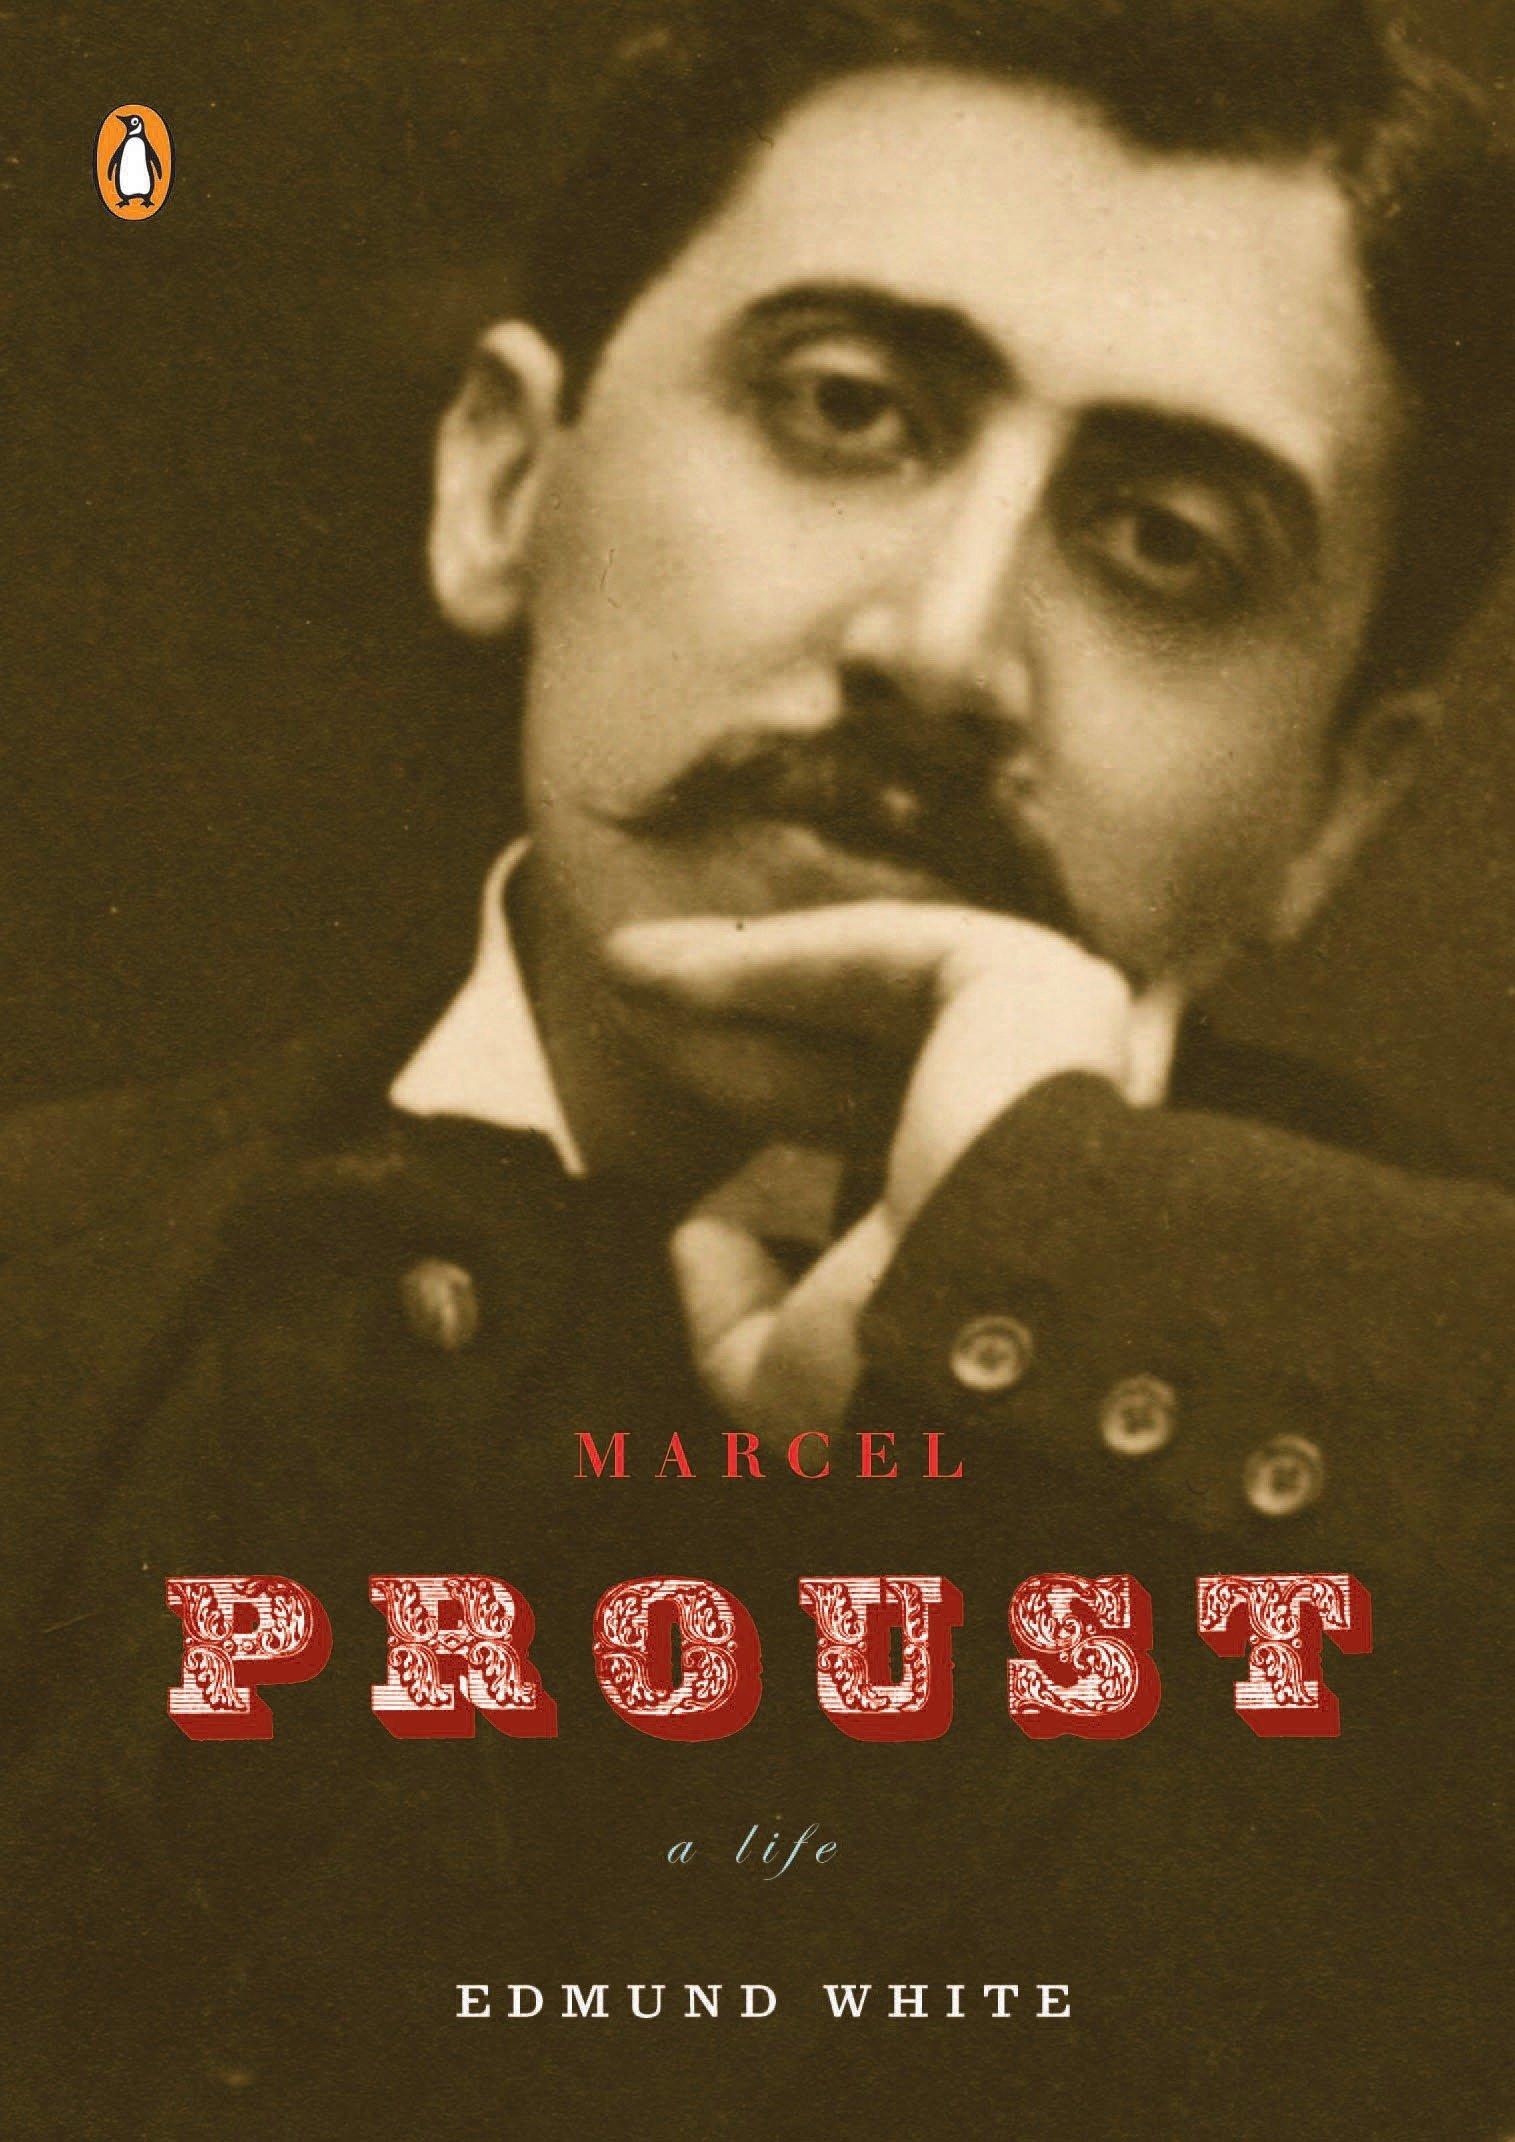 Marcel Proust: A Life (Penguin Lives) ebook